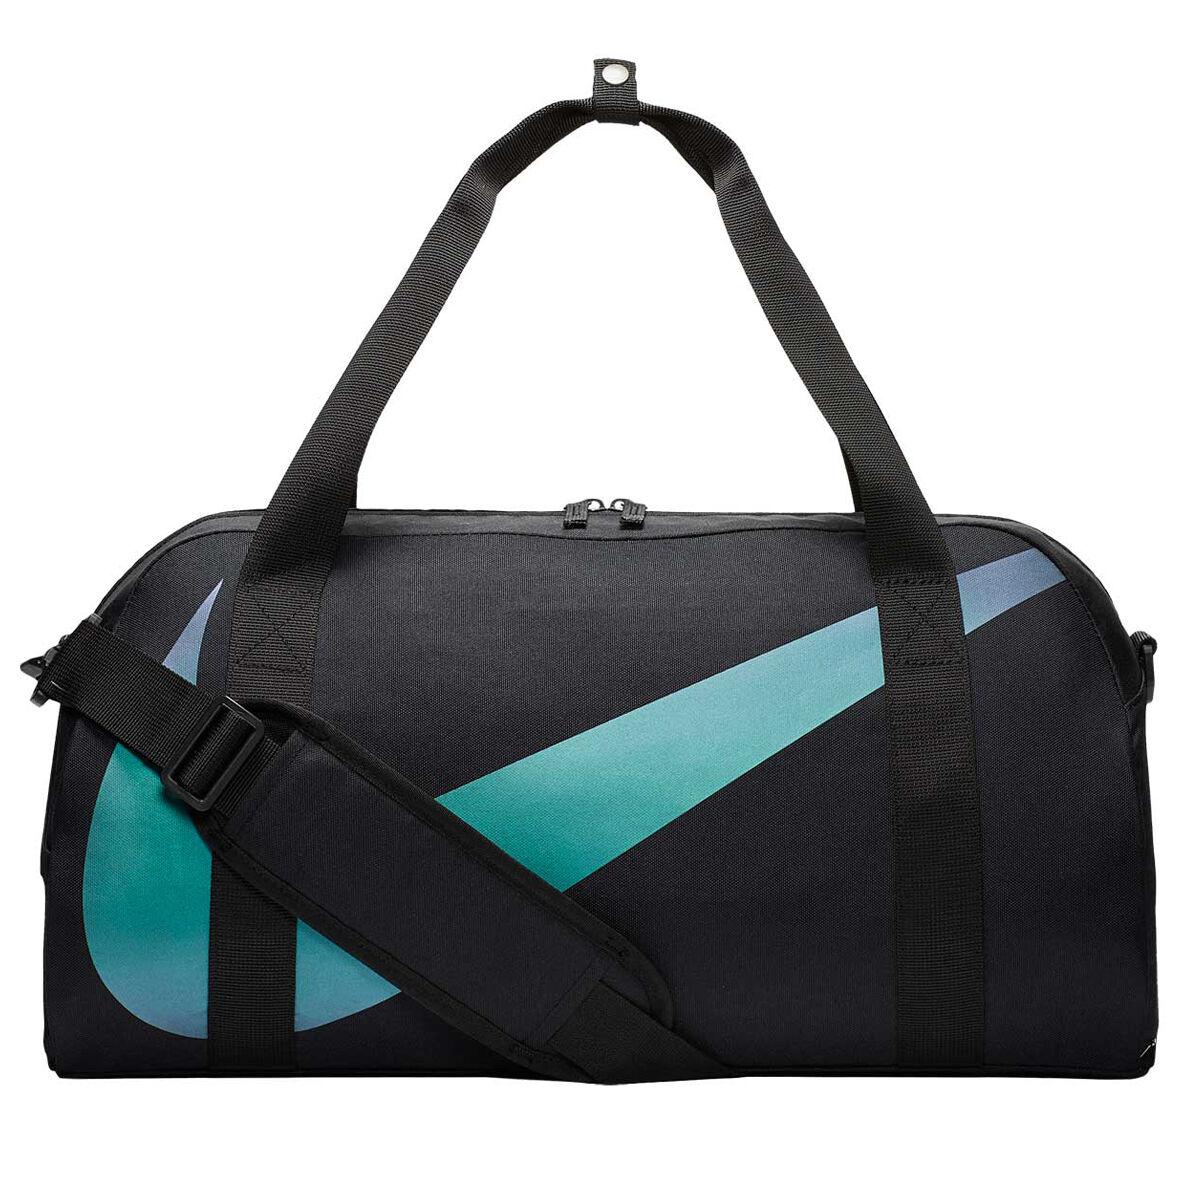 NIKE TRAINING BLUE GYM DUFFLE SOCCER FITNESS BAG